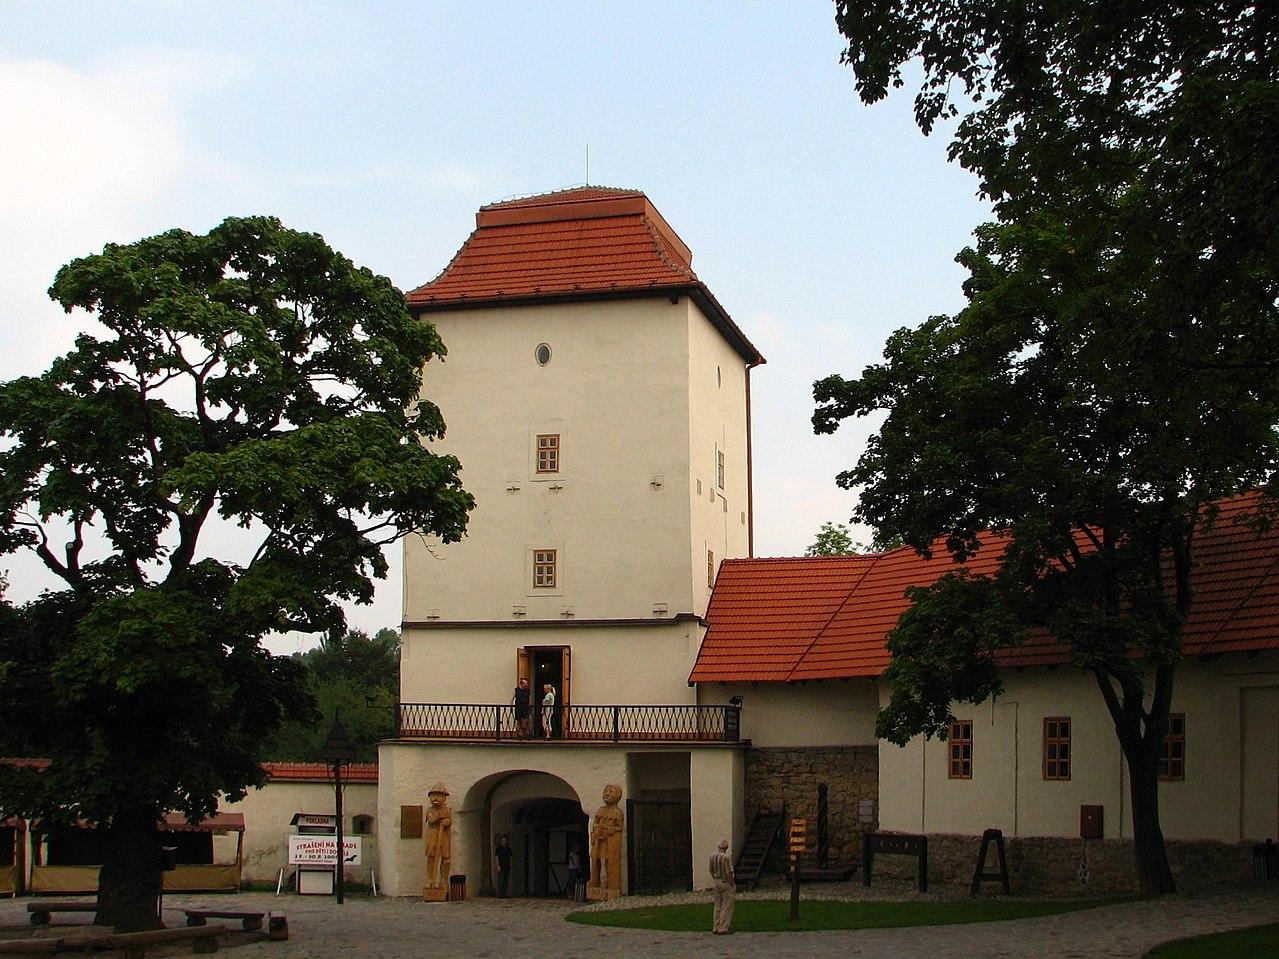 Castelul Silesian